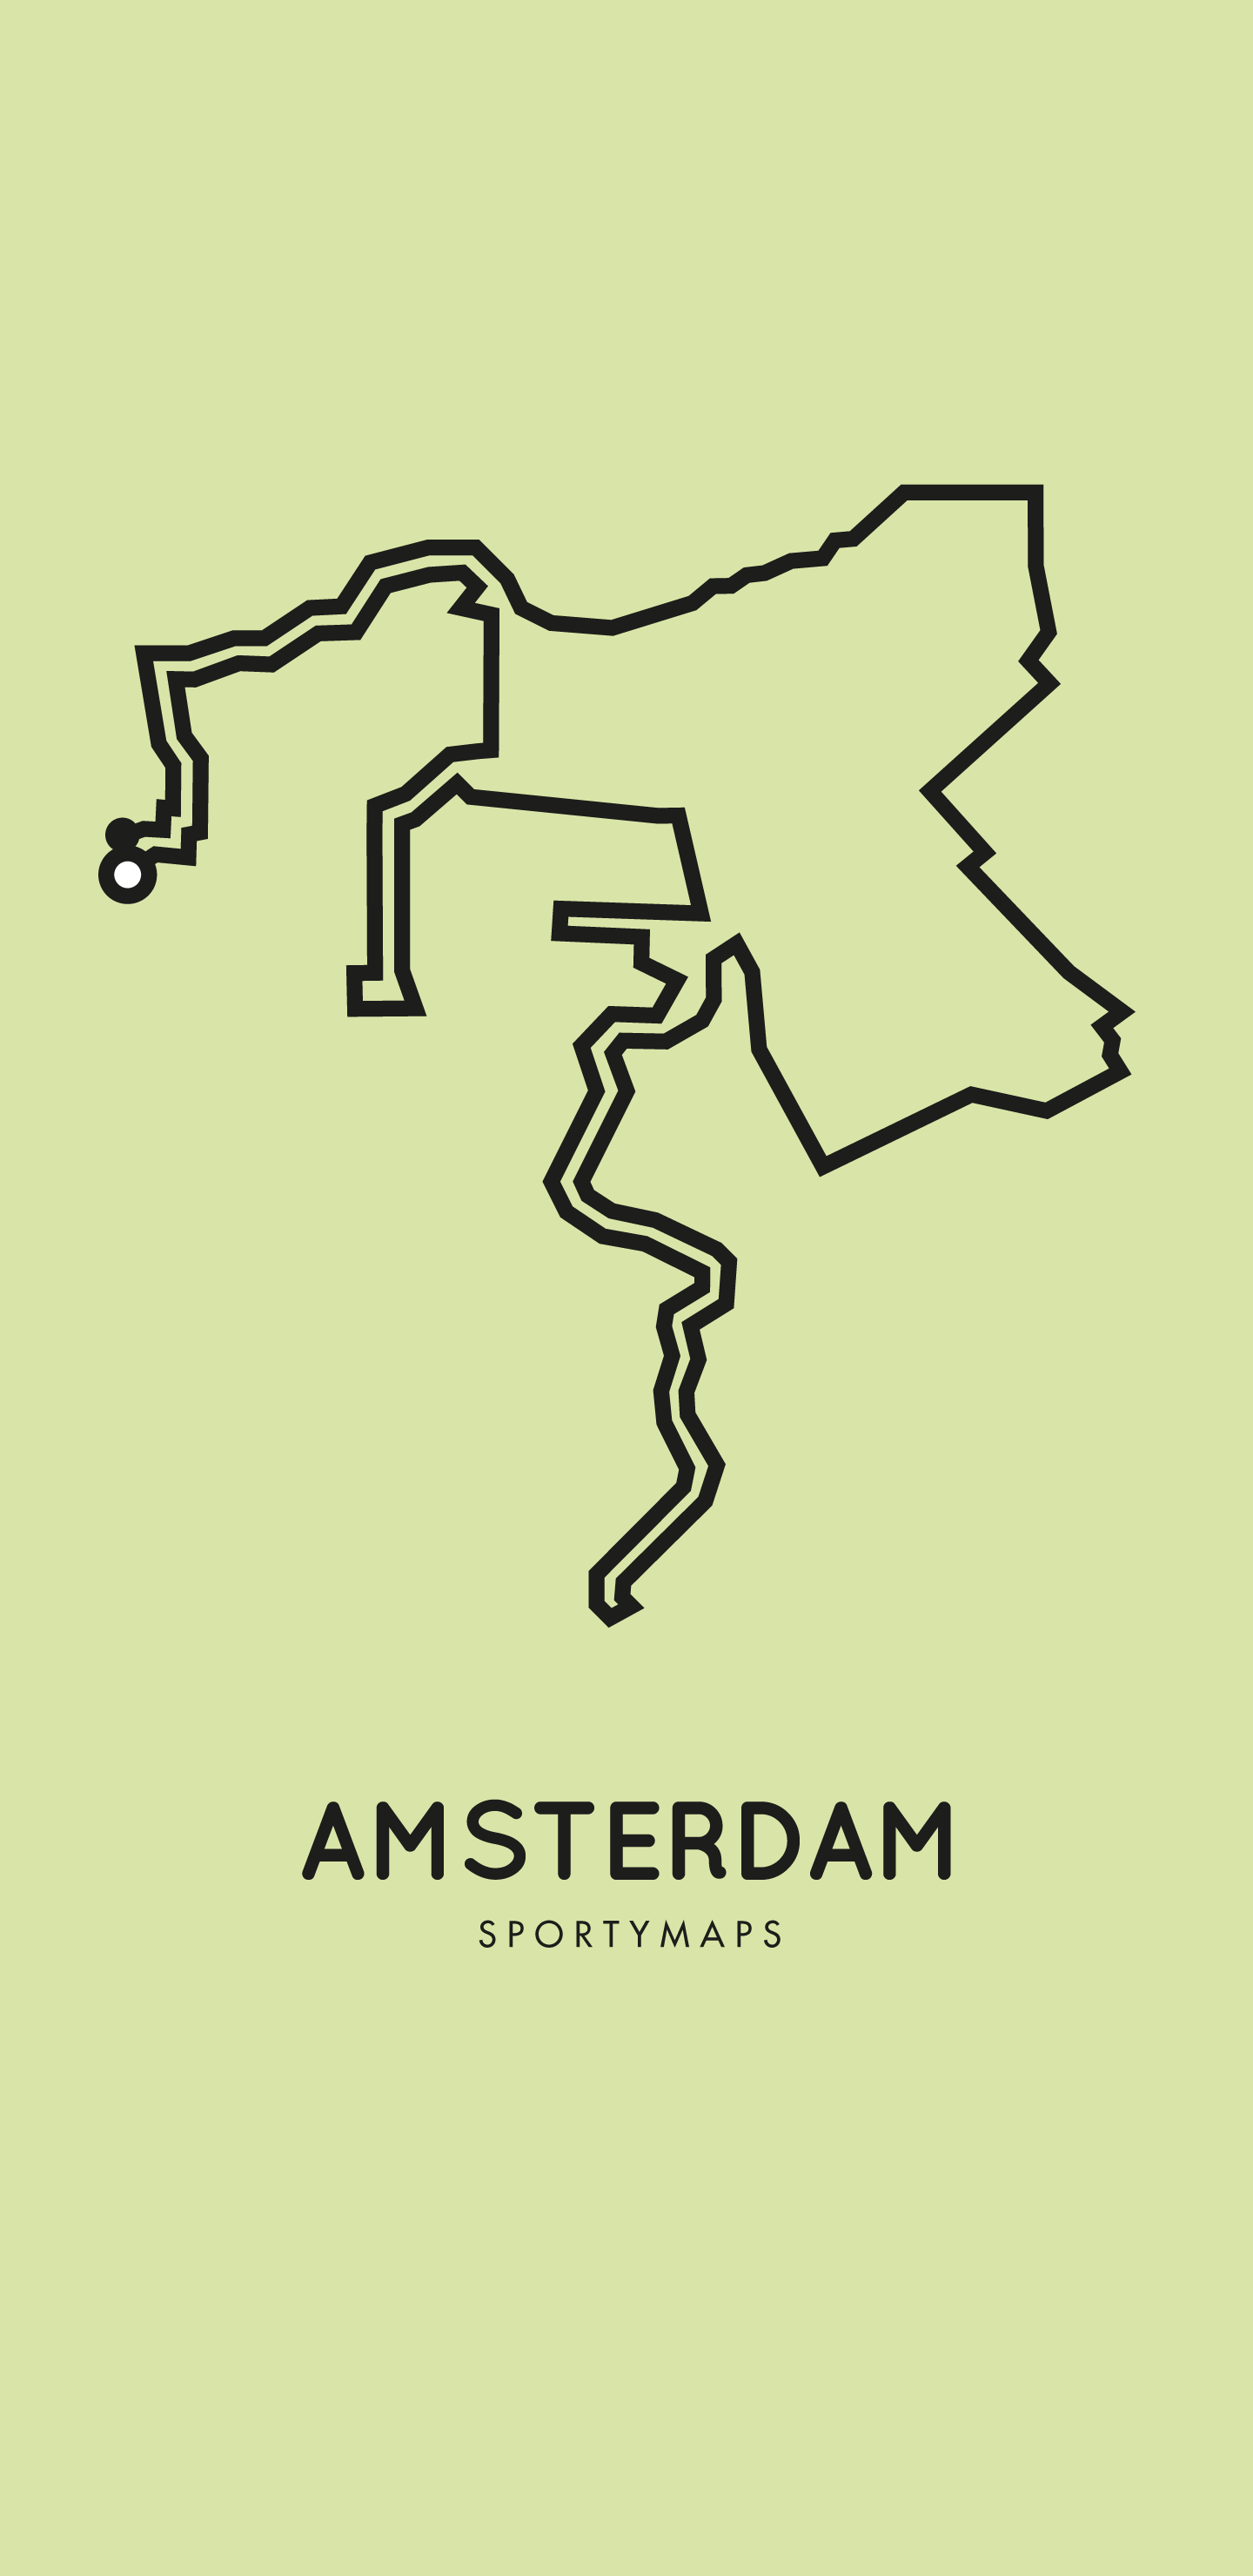 Sportymaps-Amsterdam-marathon-green